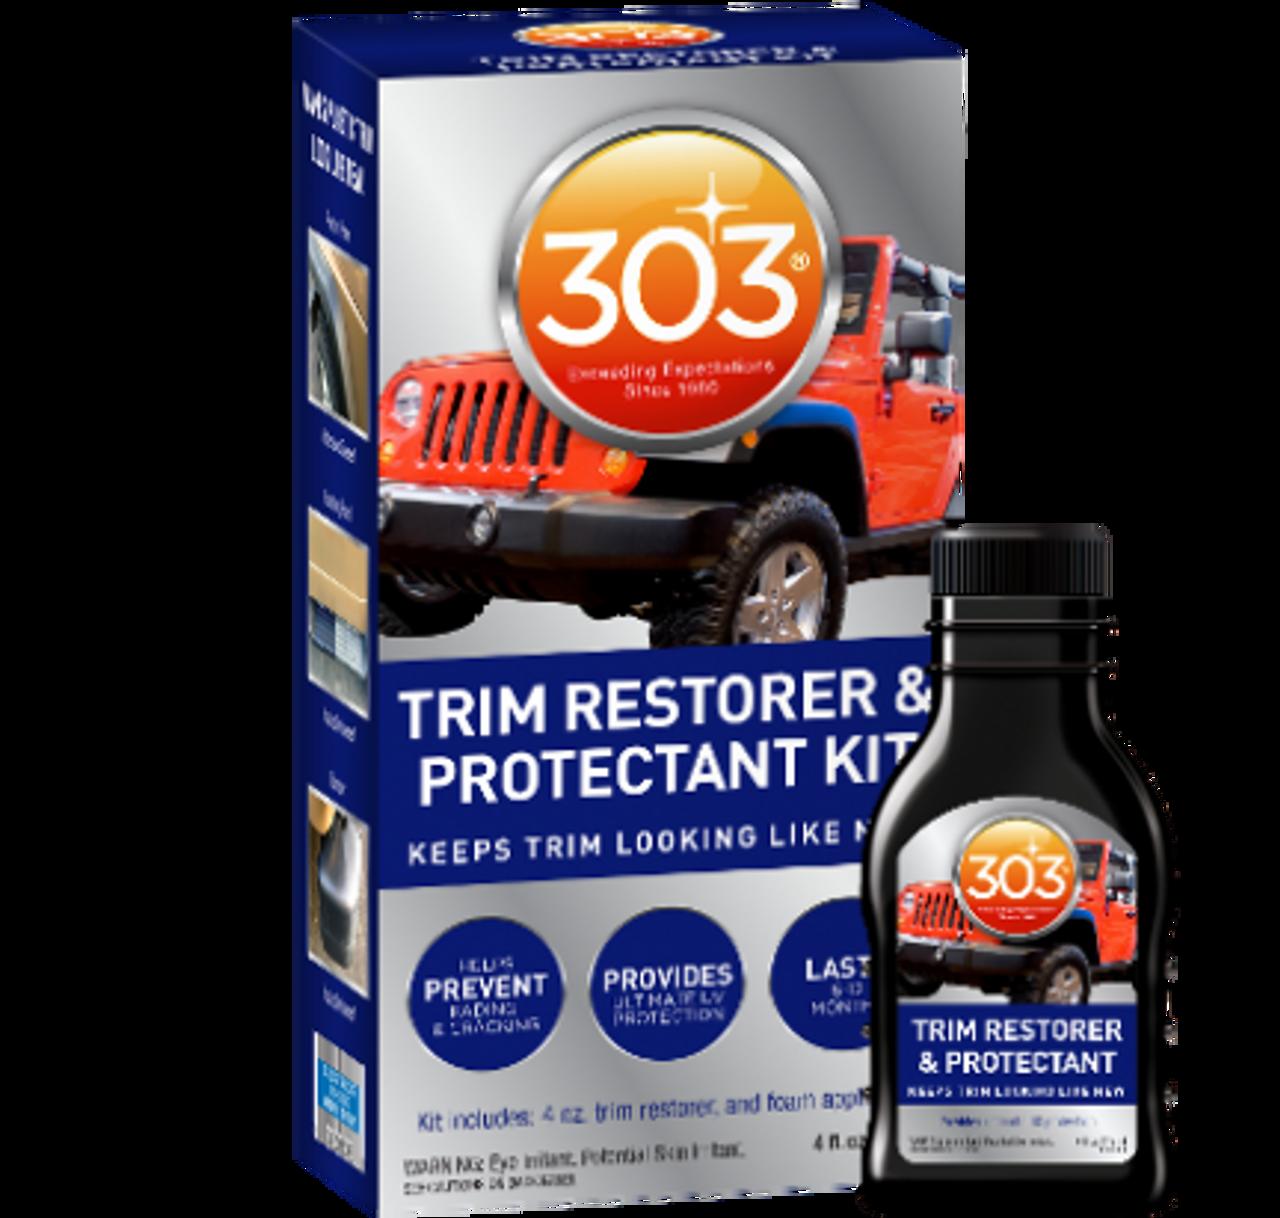 303 Trim Restorer & Protectant - Restores colour to car bumpers & trim